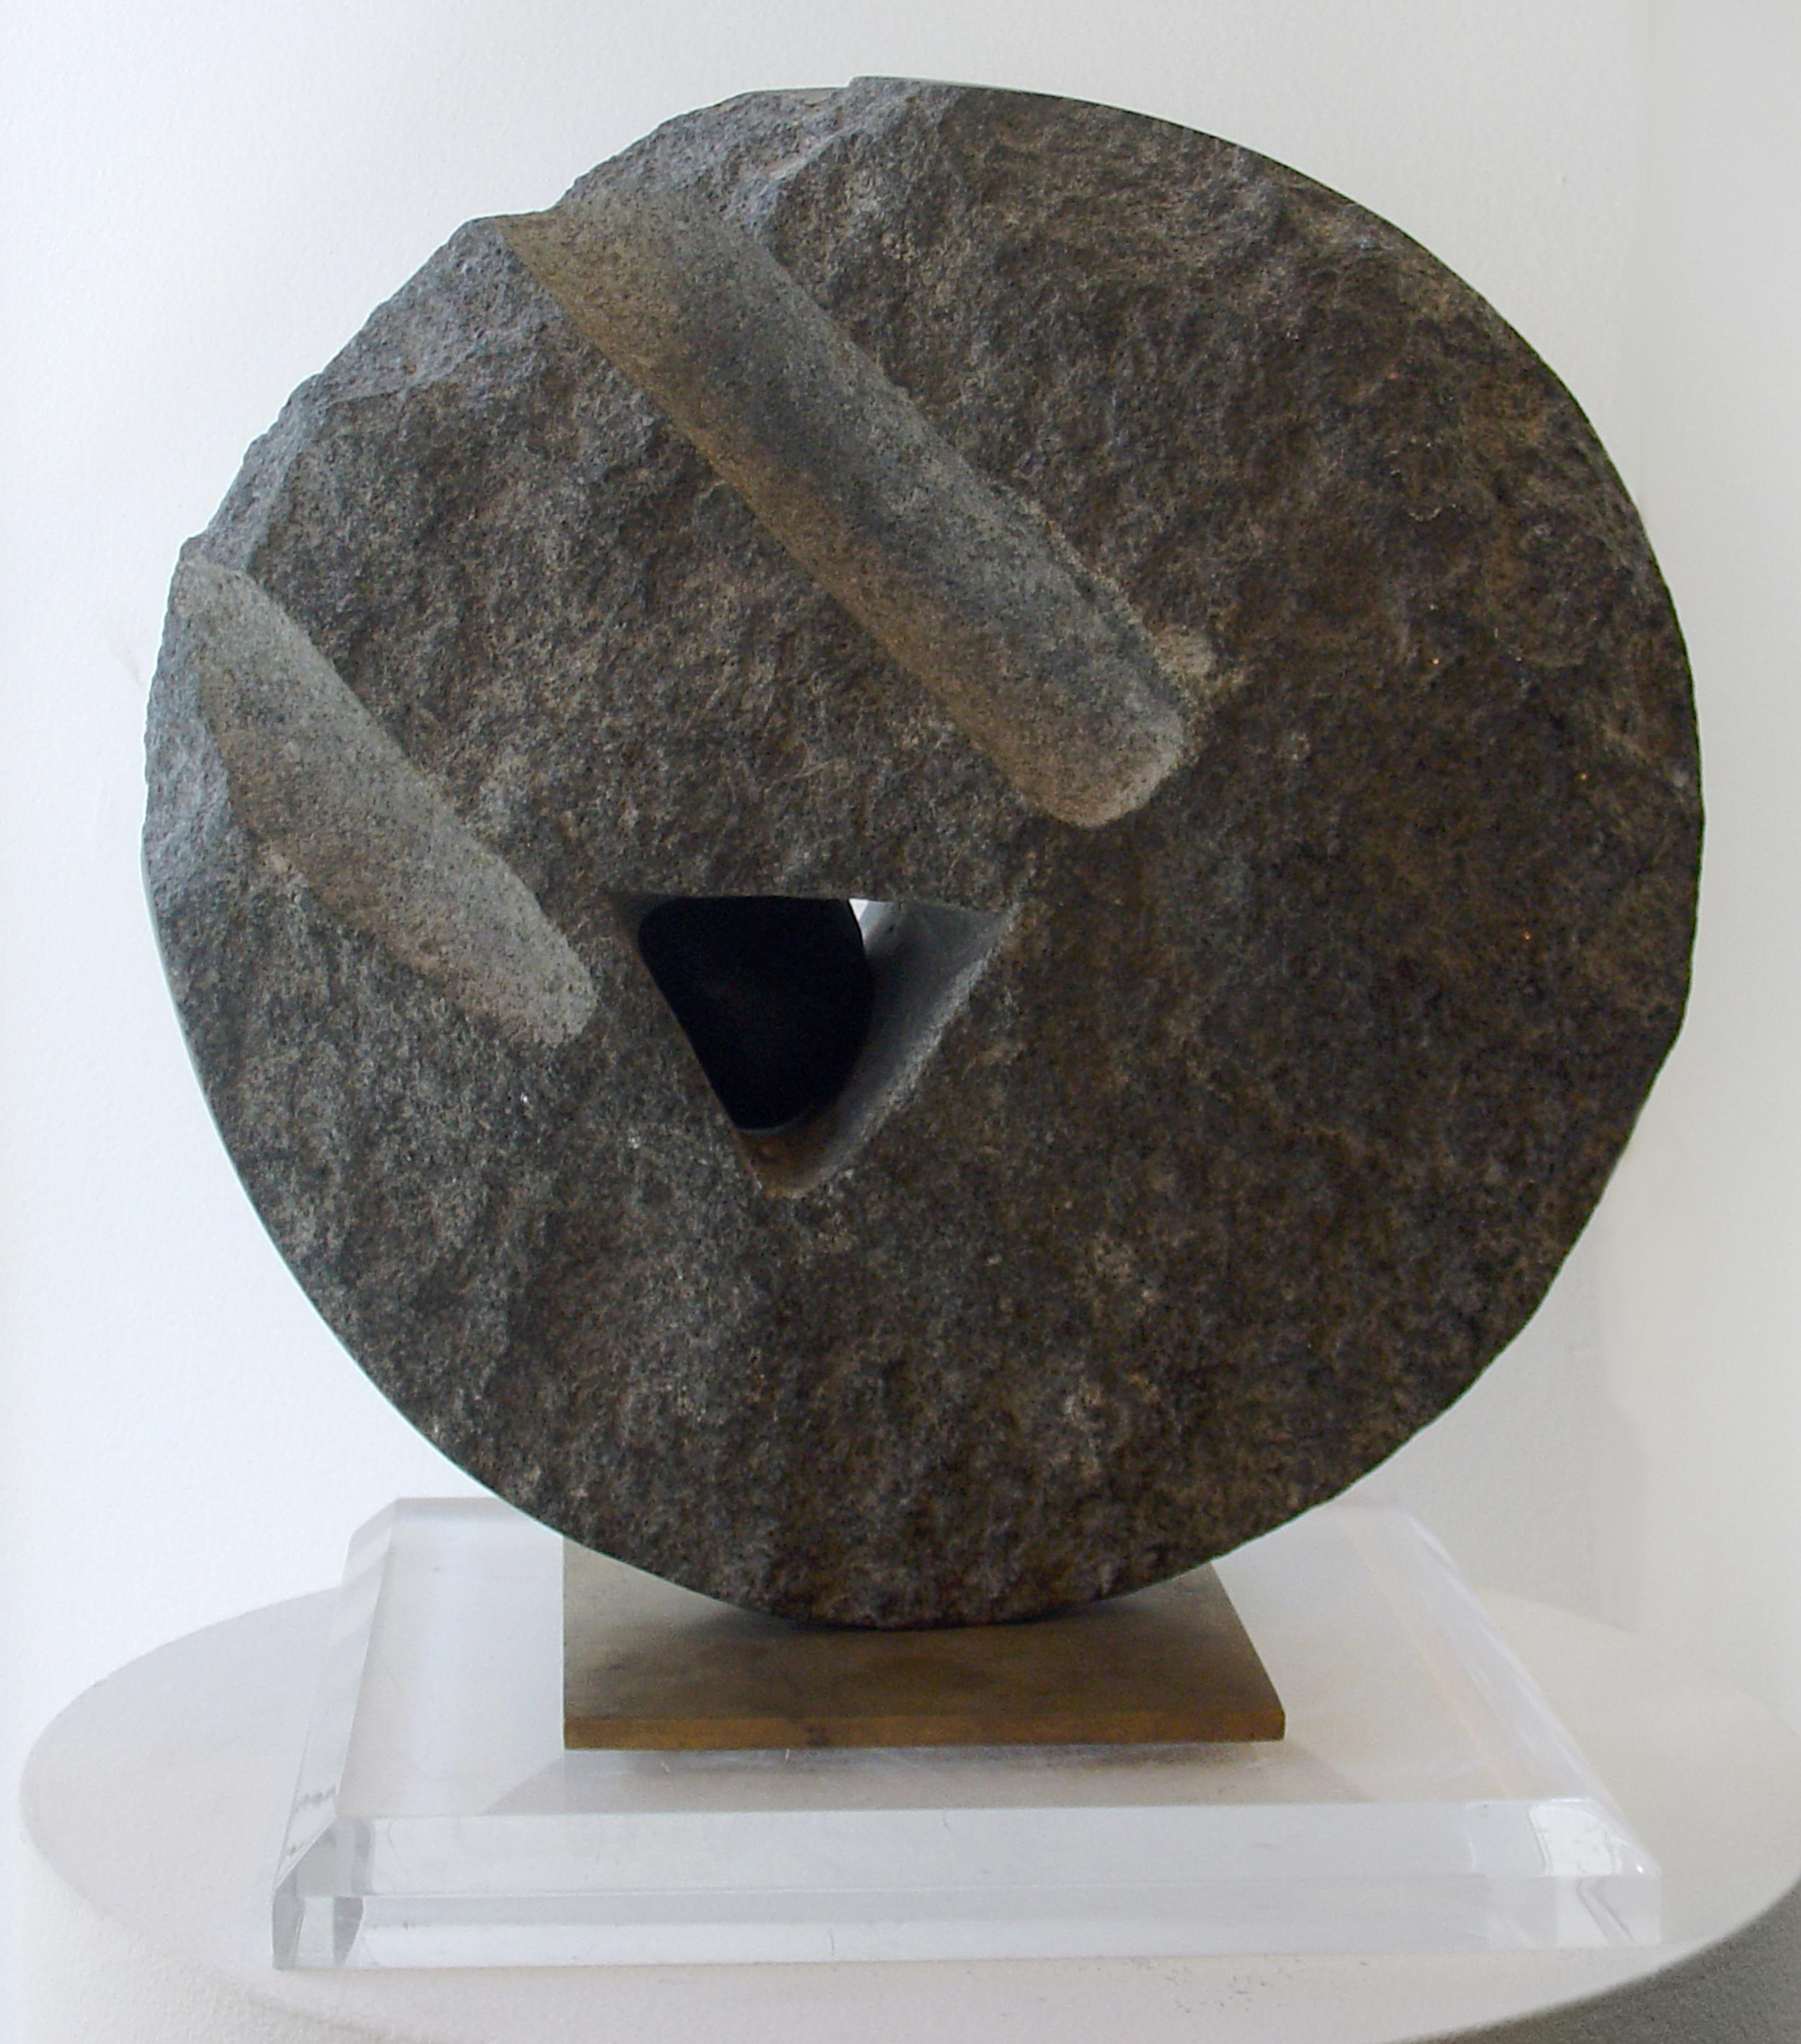 "Lika Mutal    Small Stone of Origin  , 1998  black granite and onyx  12"" x 12"" x 5 1/4"""